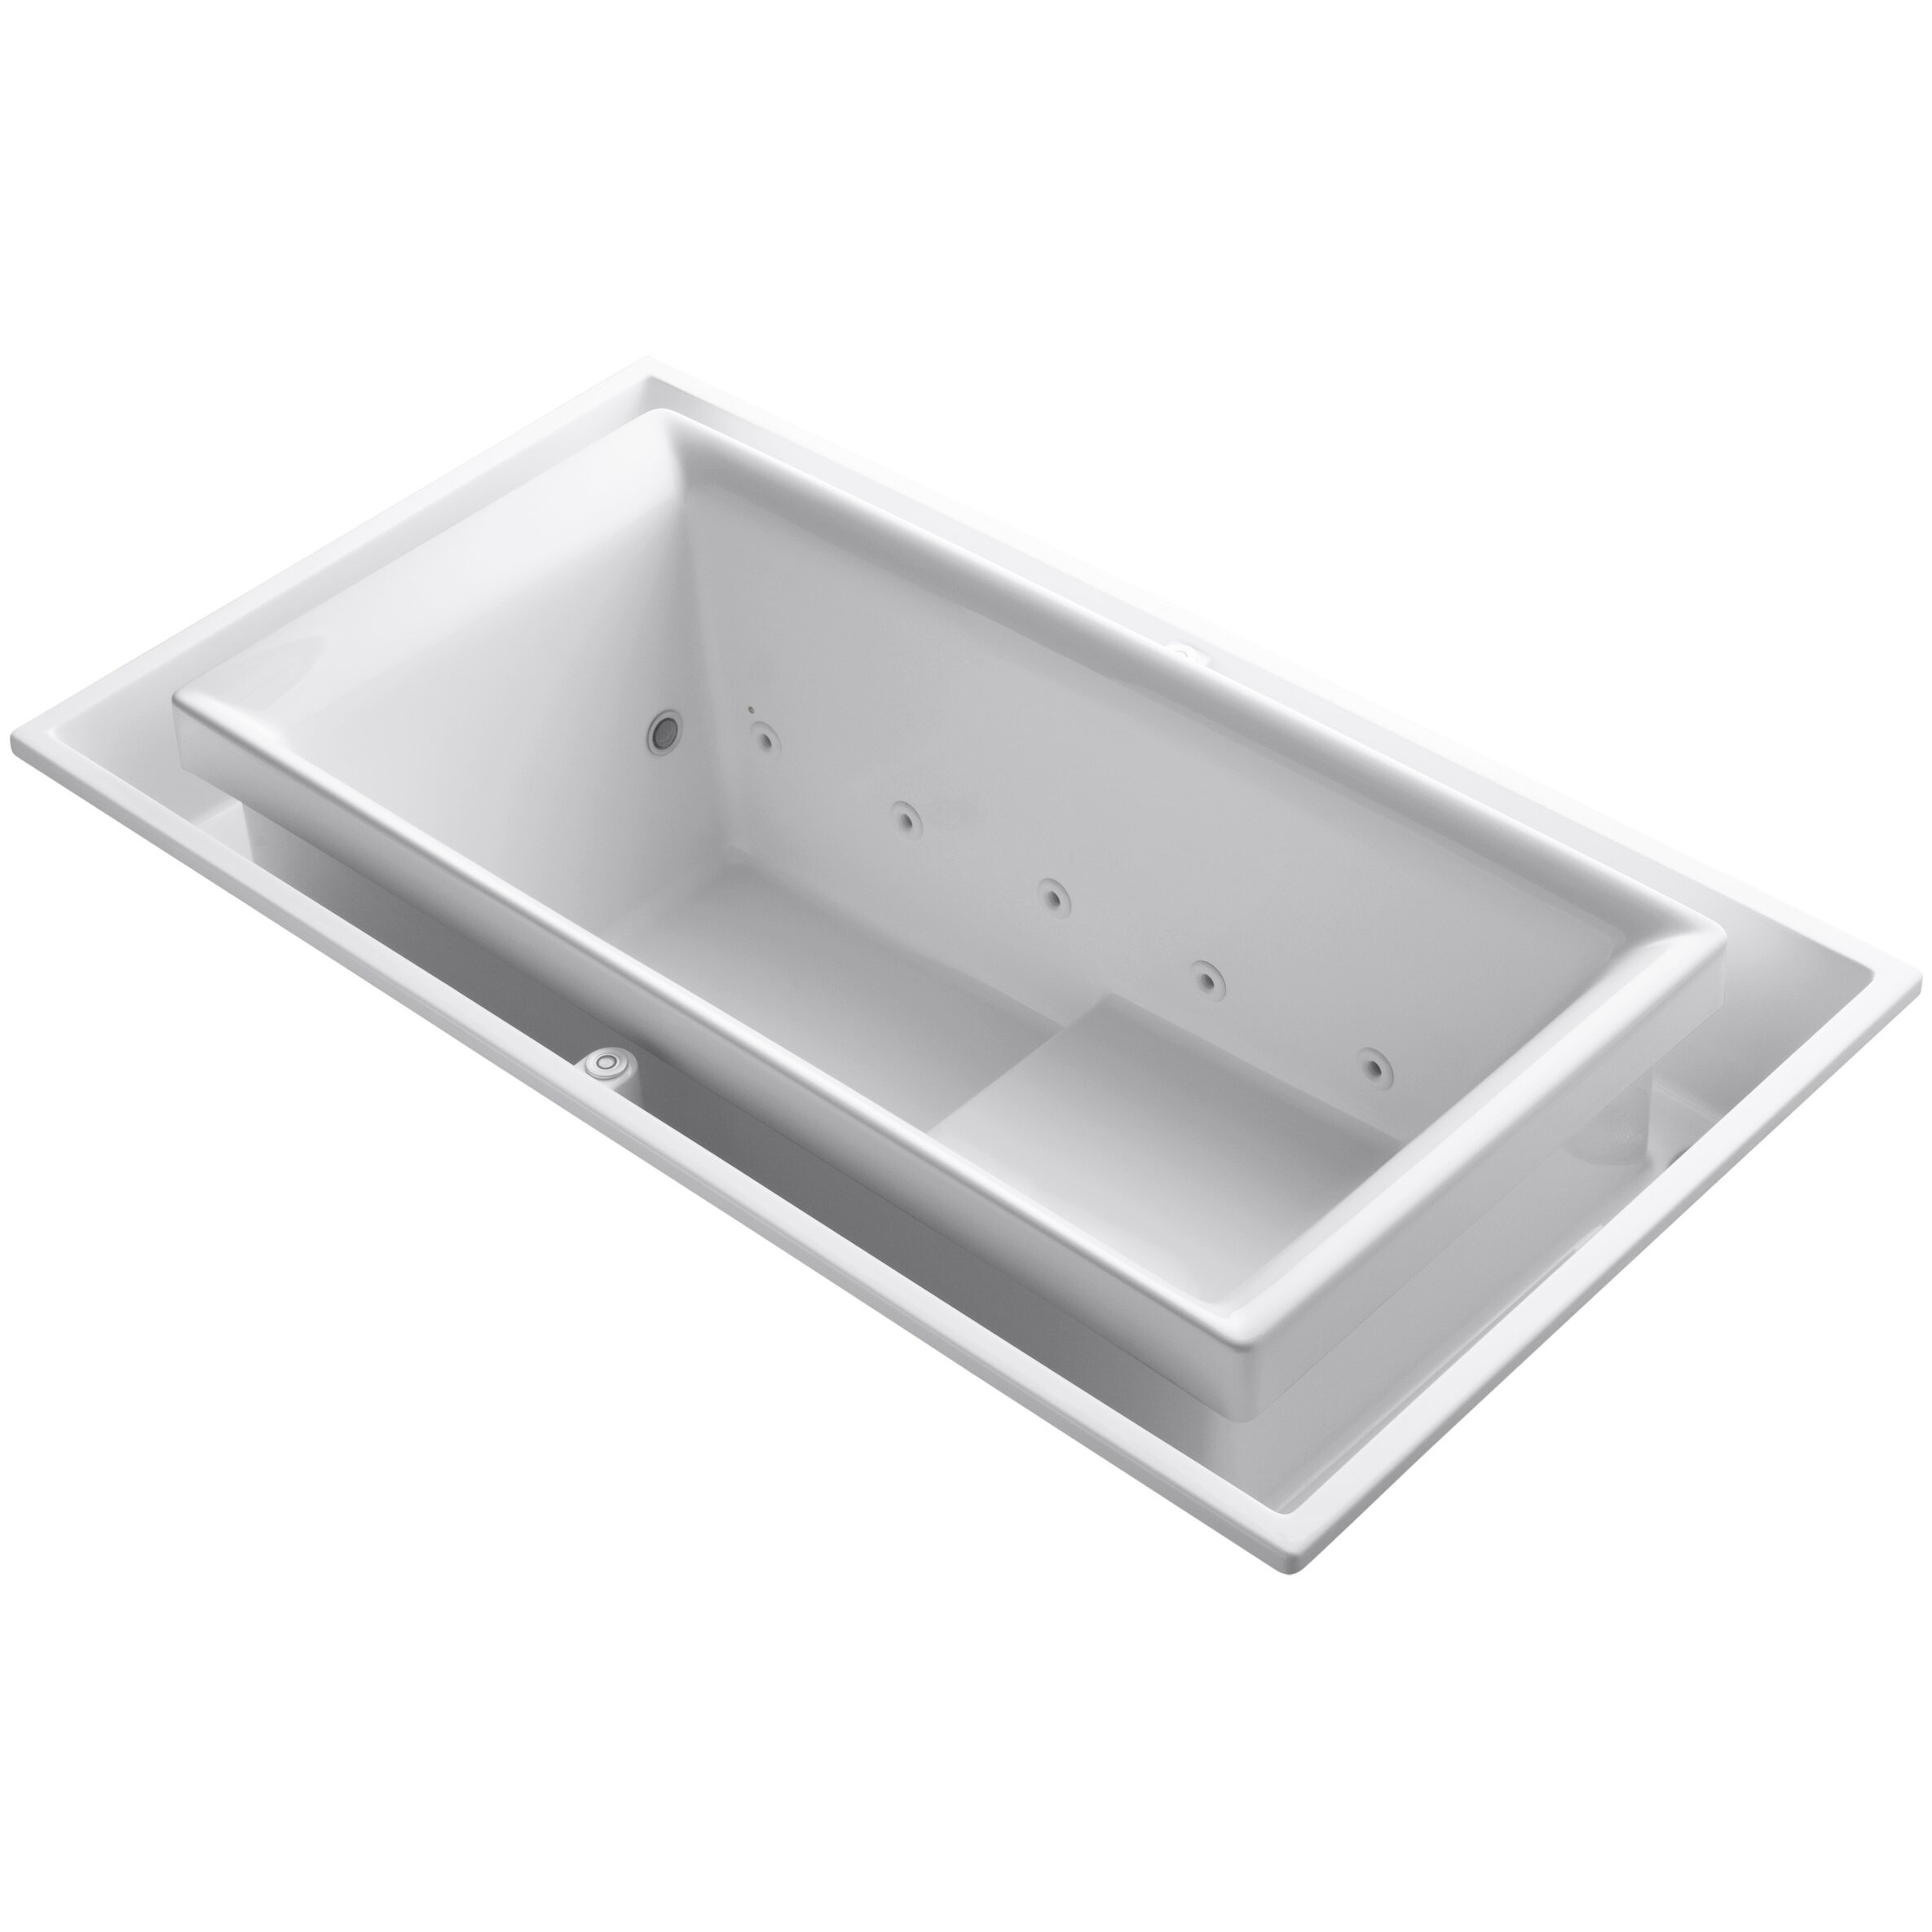 "Kohler Sok 75"" X 41"" Air / Whirlpool Bathtub"